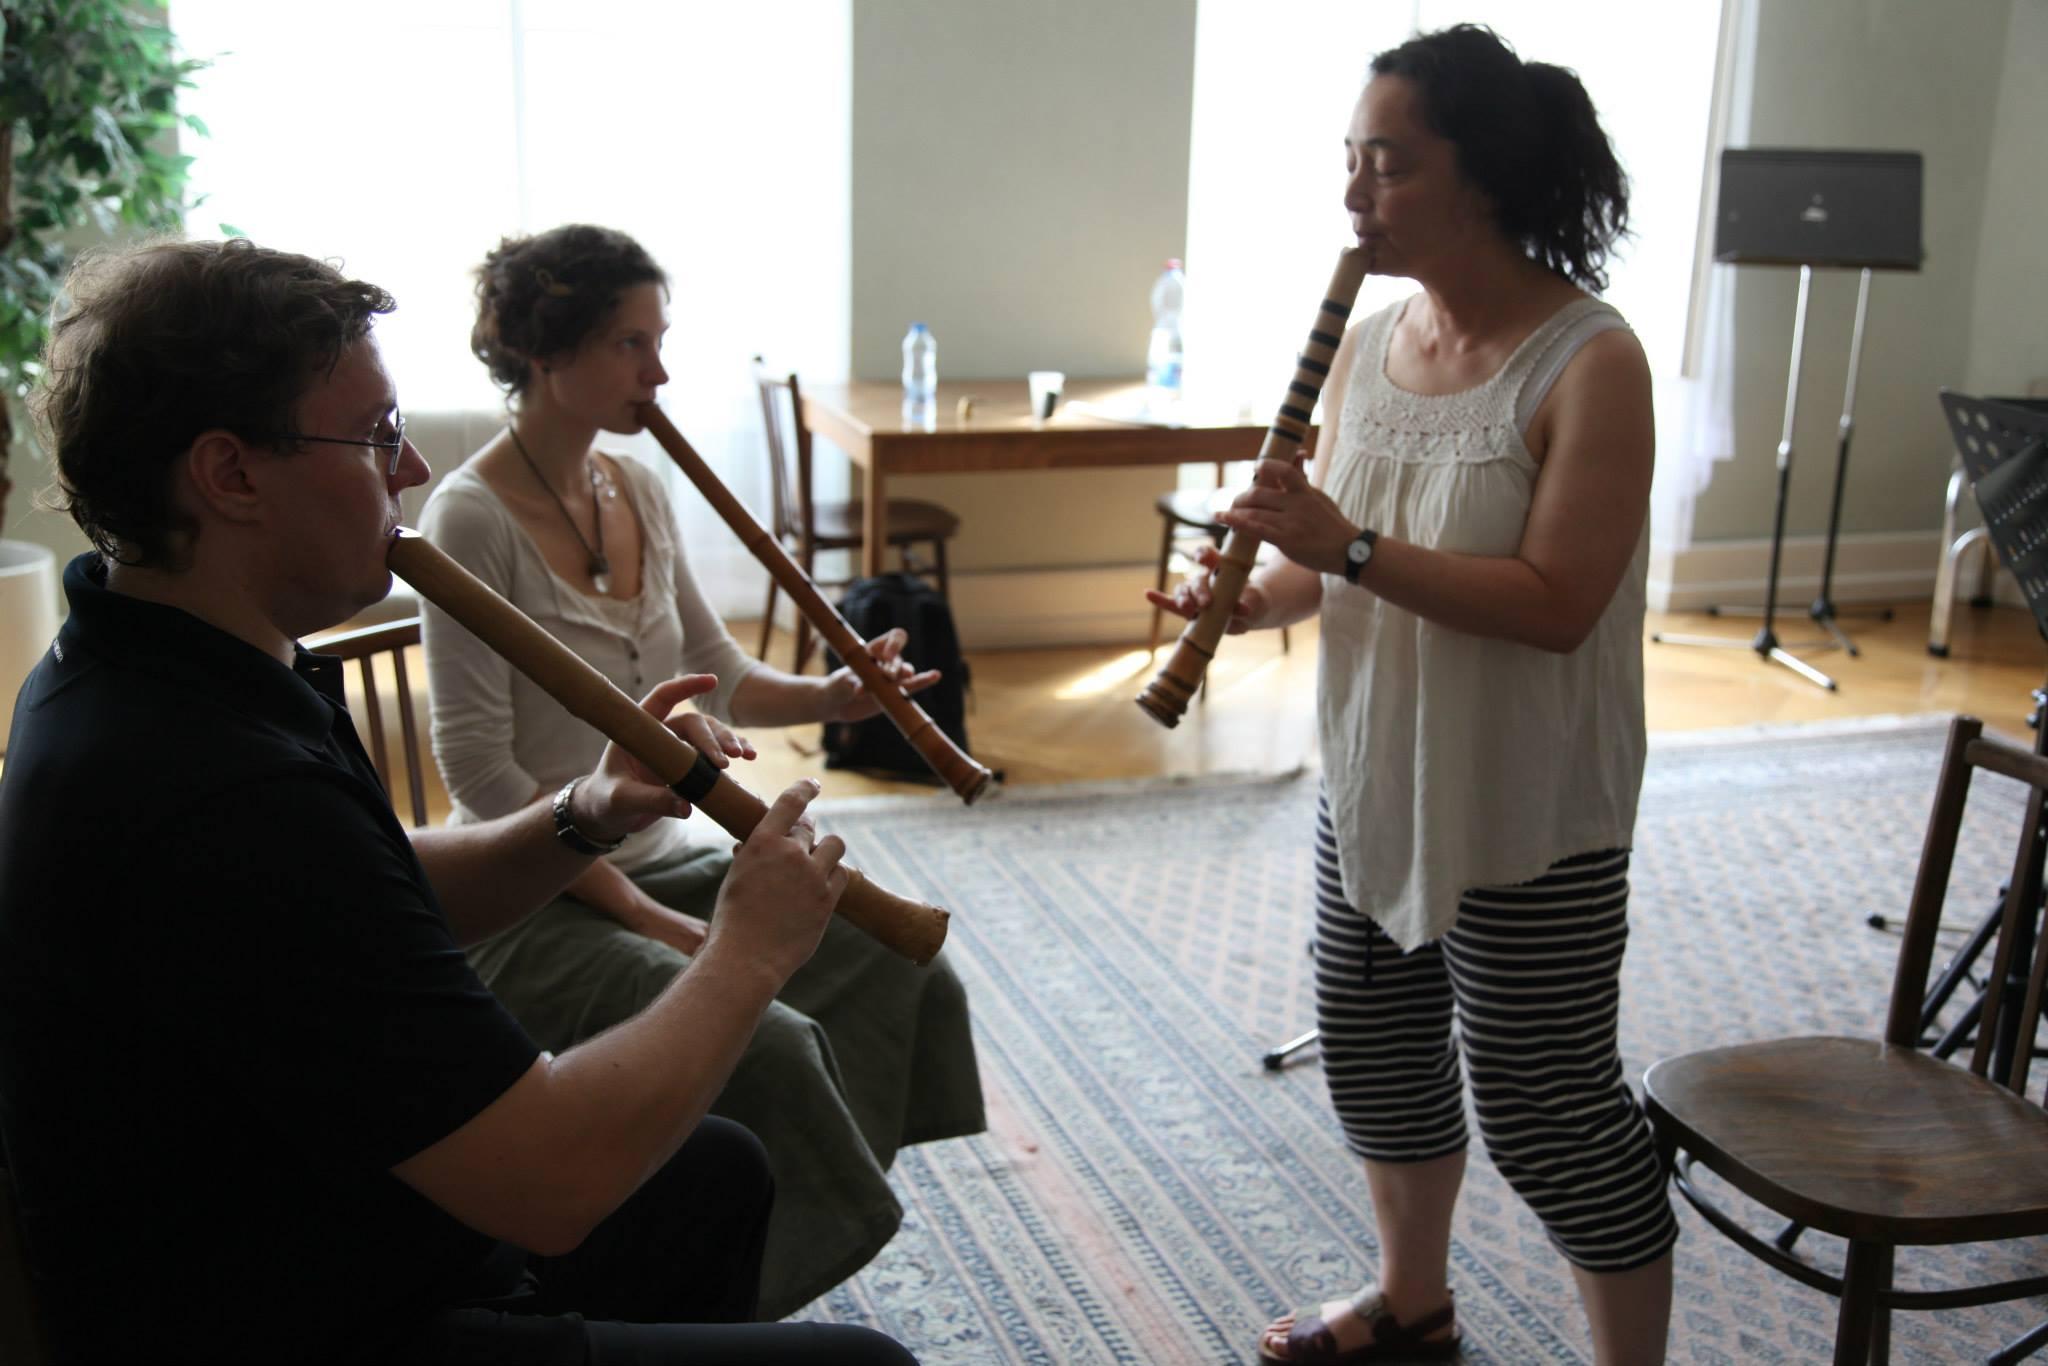 Kiku Day teaching absolute beginners at ISFP 2013